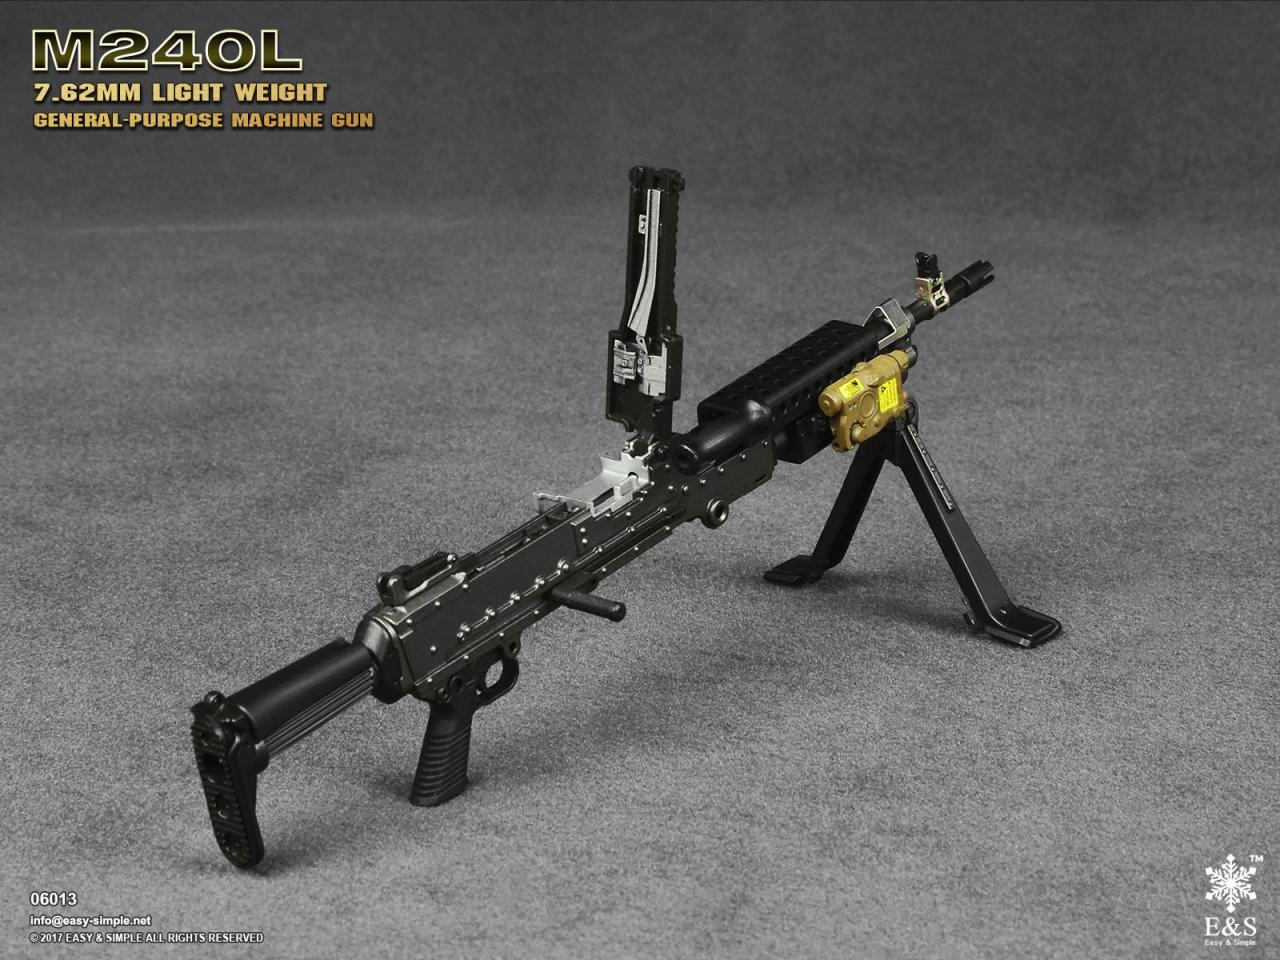 Easy&Simple 06013 M240L 7.62mm Light Weight General Purpose Machine Gun-06013-10-jpg